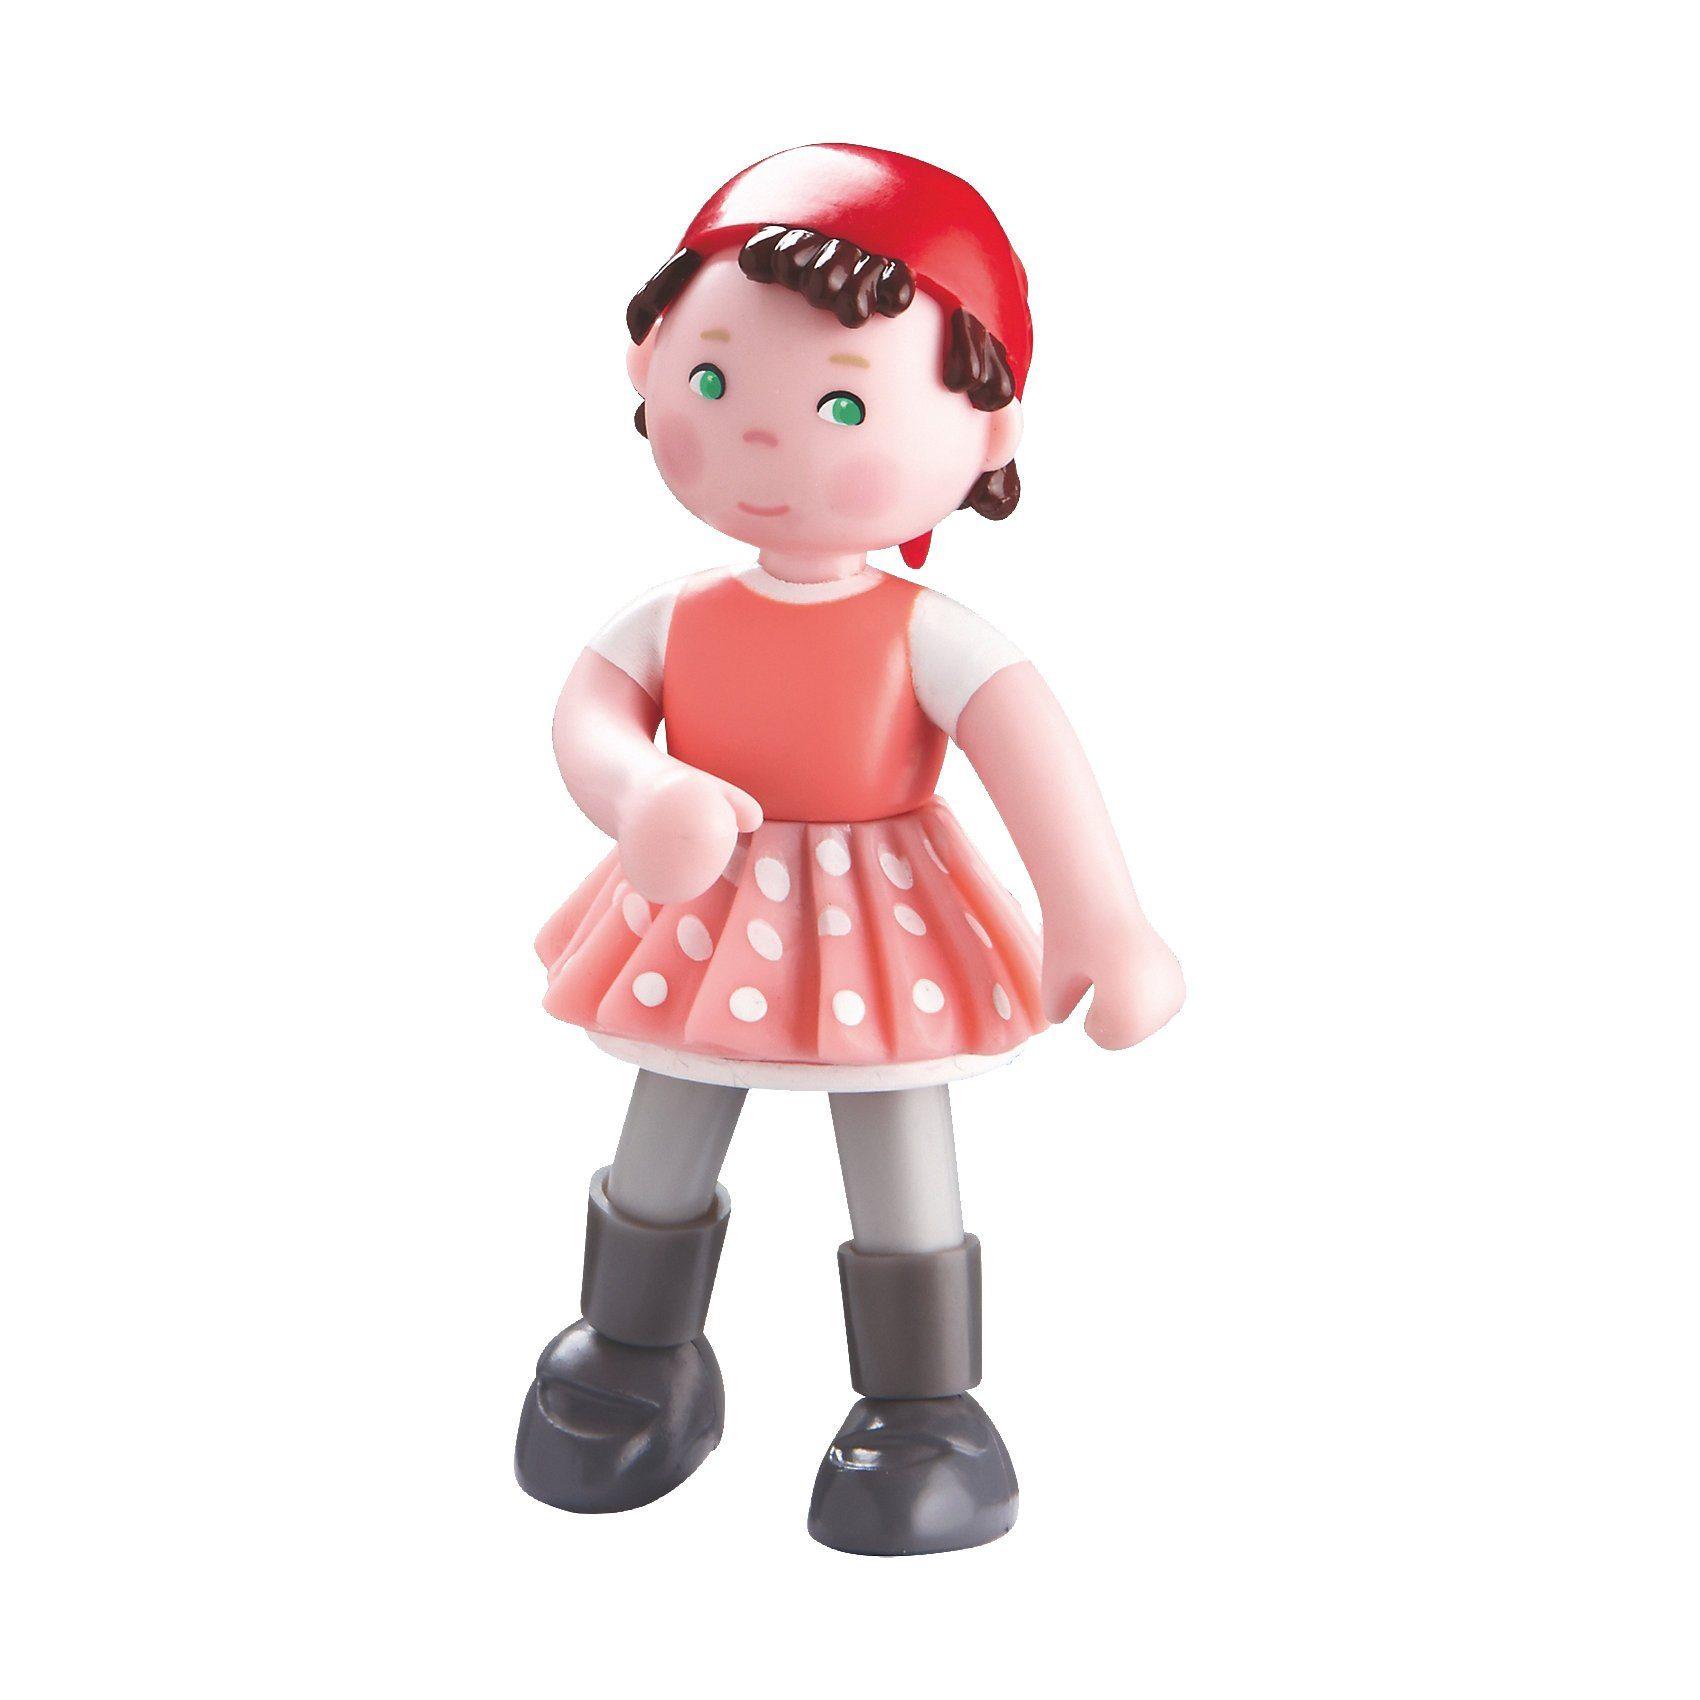 Haba 301970 Little Friends Puppe Lisbeth